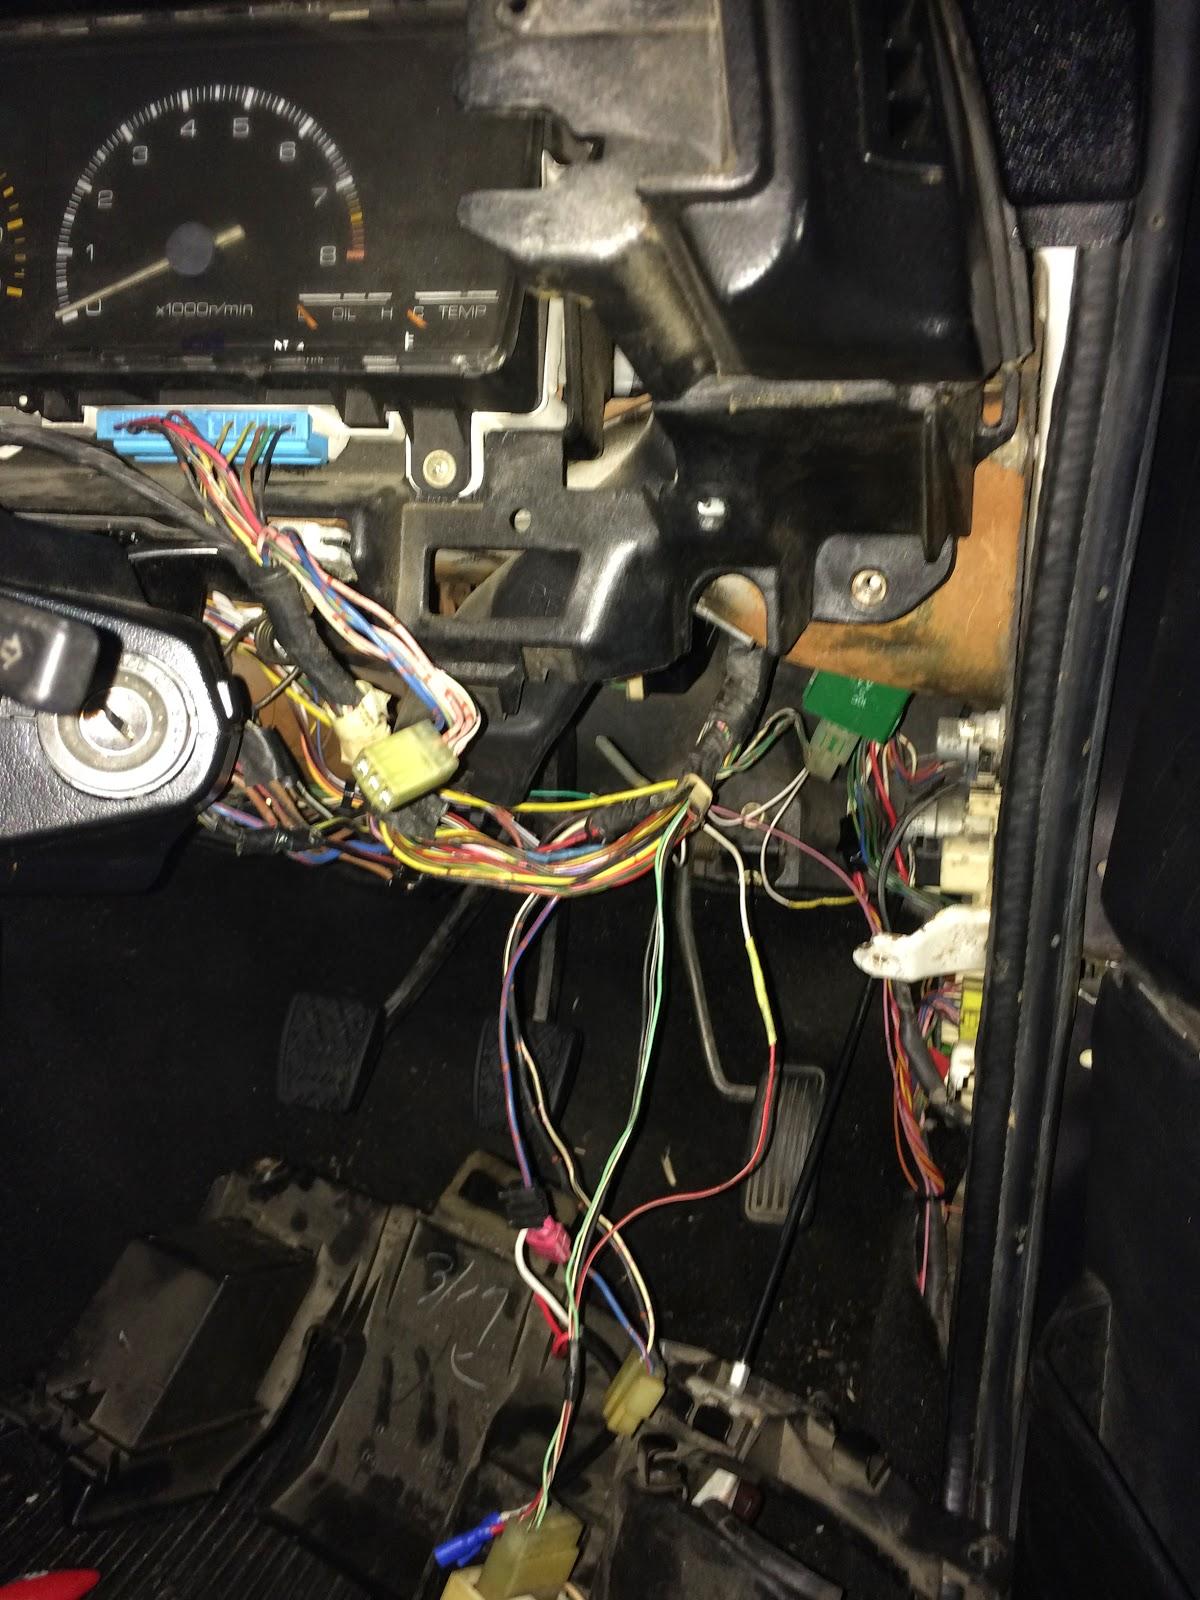 Tysons AE86 Trueno: Electricals - Headlights | Ae86 Headlight Wiring Diagram |  | Tysons AE86 Trueno